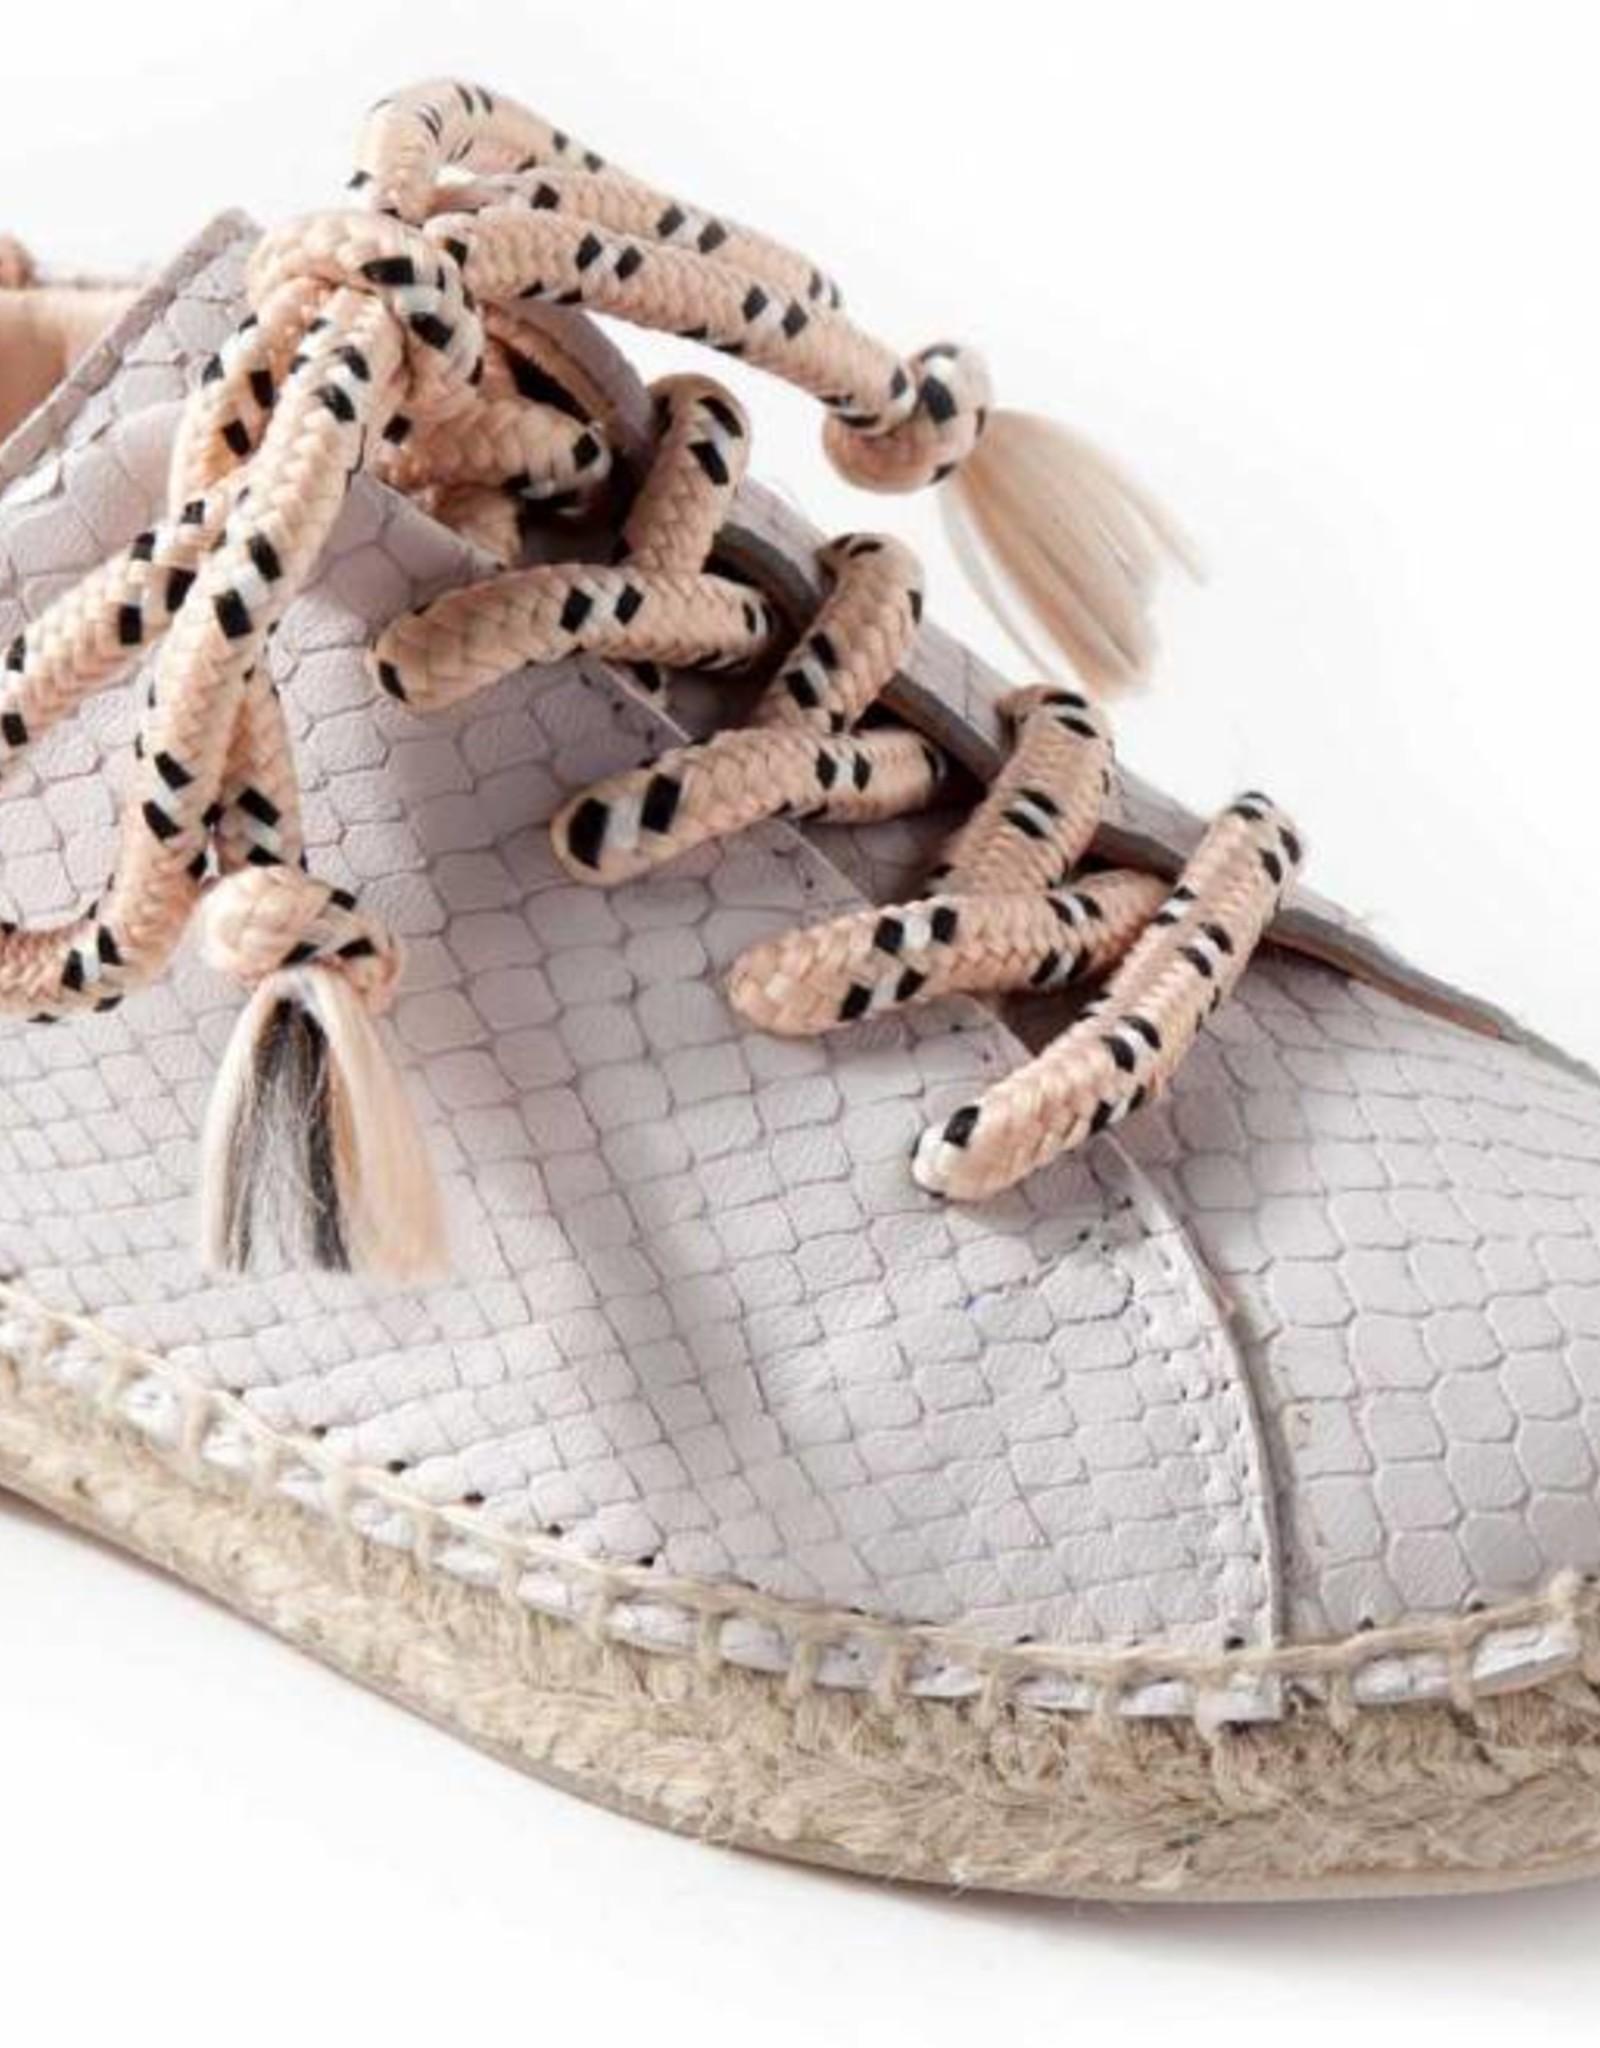 Maison Mangostan Guarana shoes